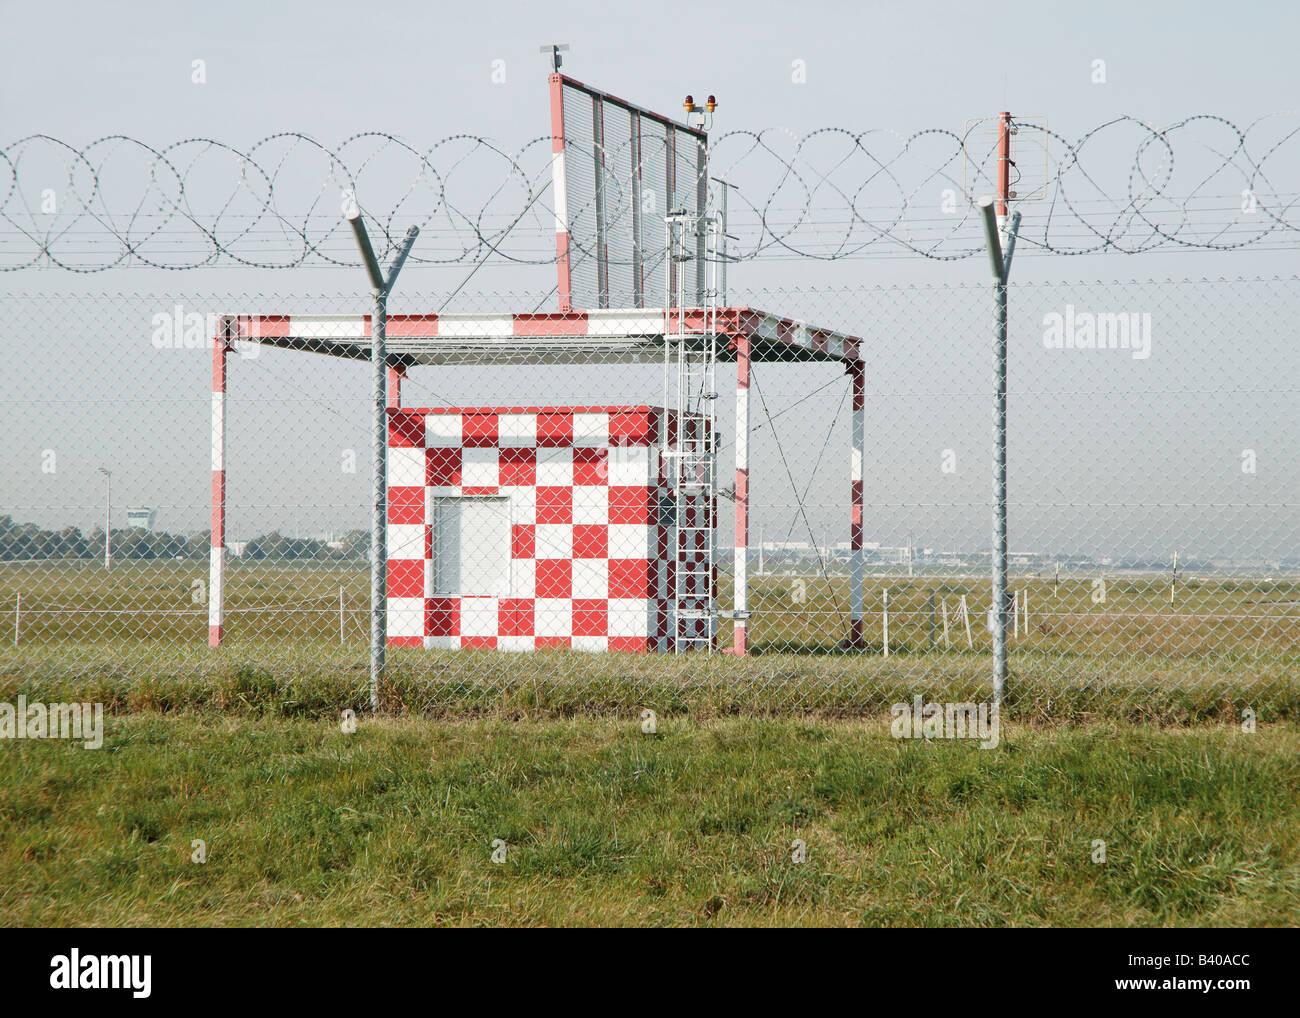 Wetterstation am Flugplatz hinter Maschendrahtzaun Stockbild